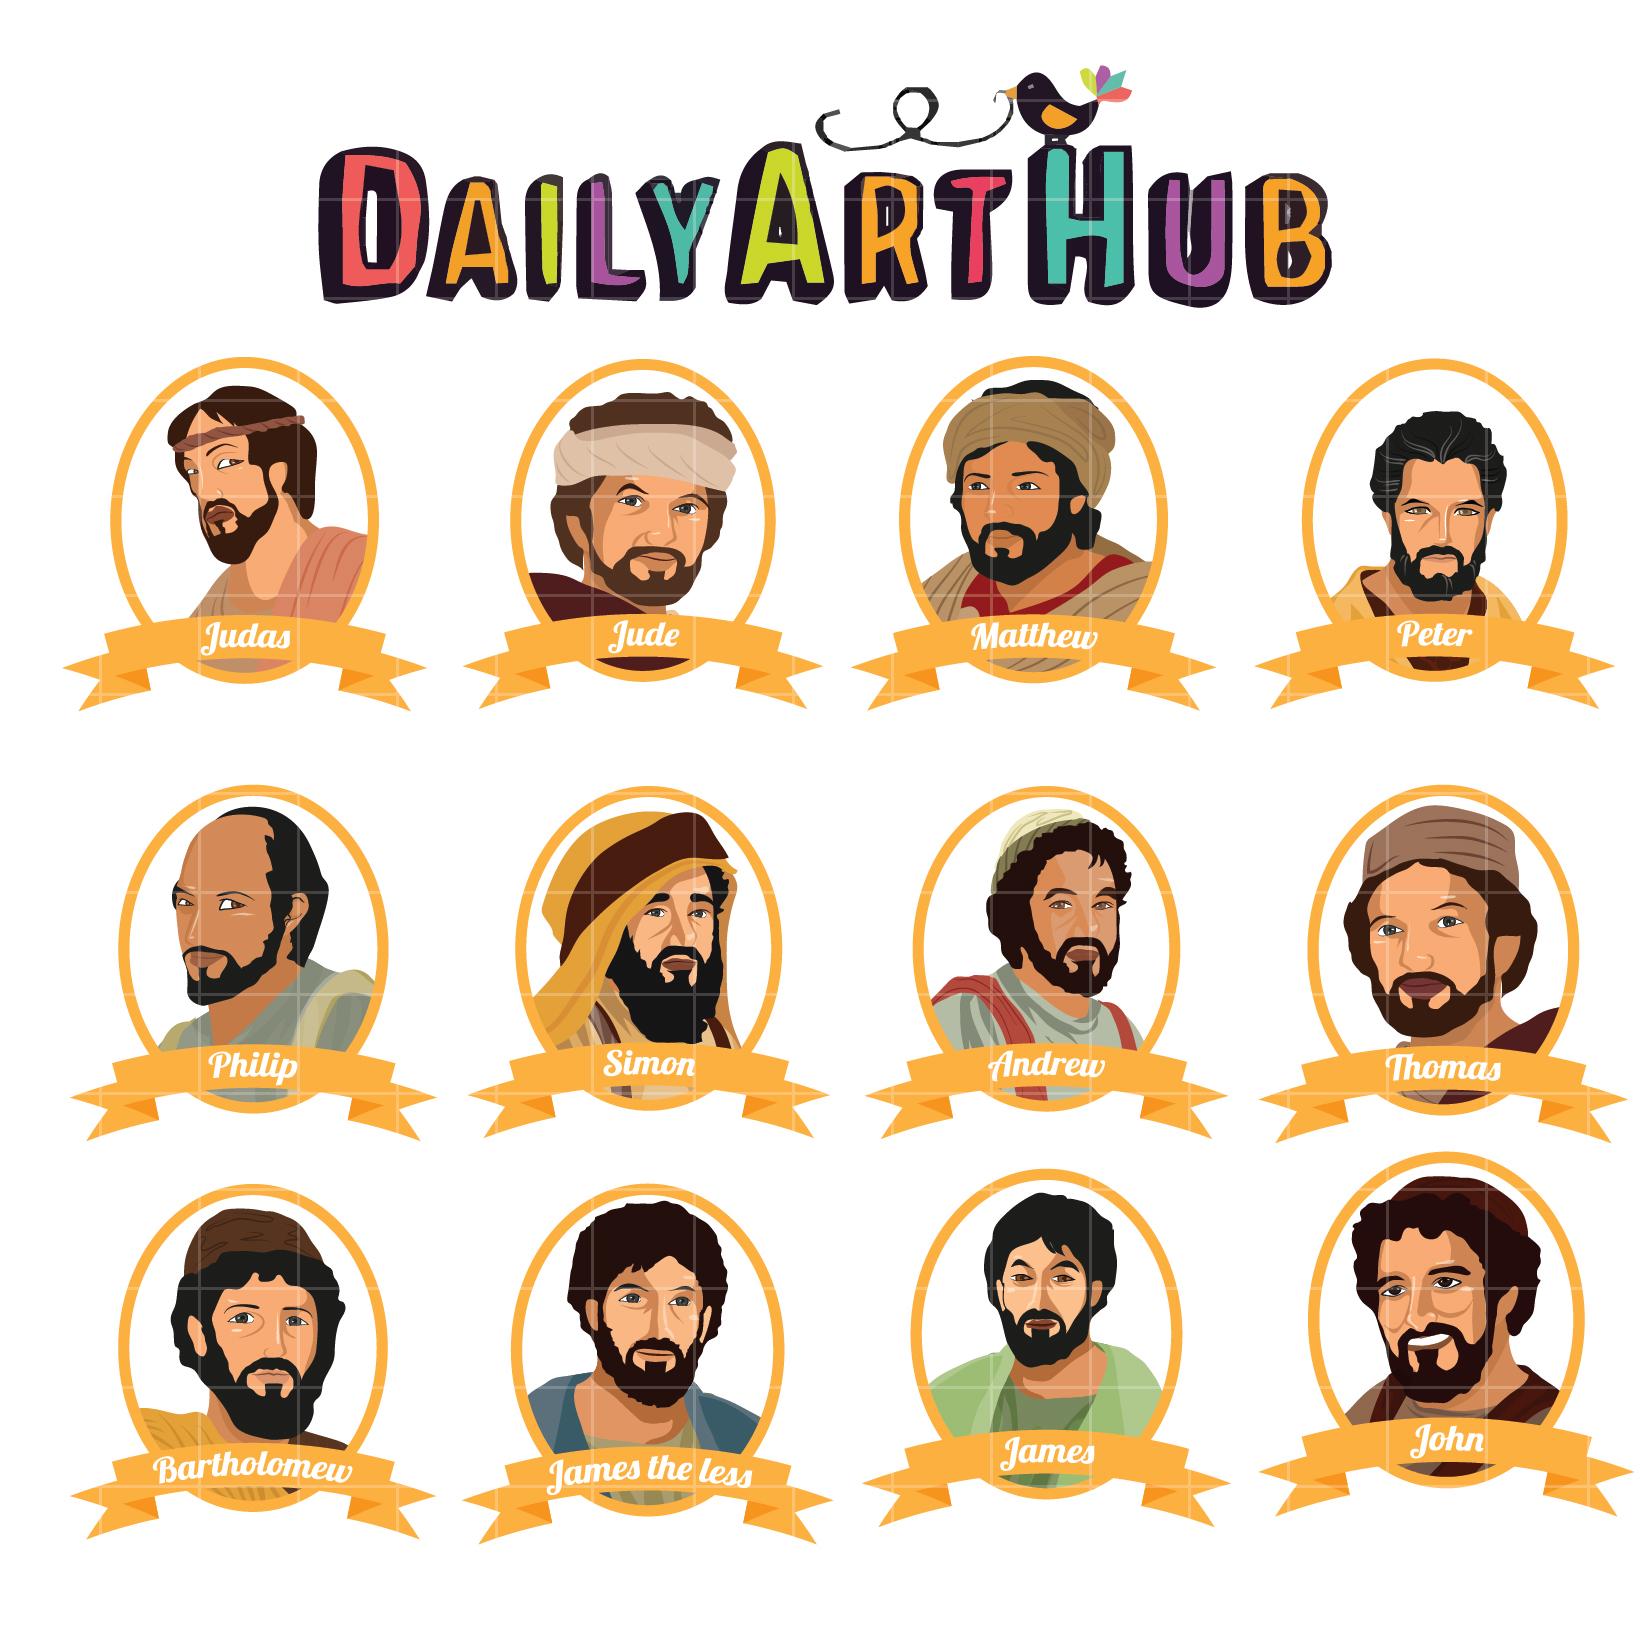 12 Deciples Of Jesus Clip Art Set Daily Art Hub Free